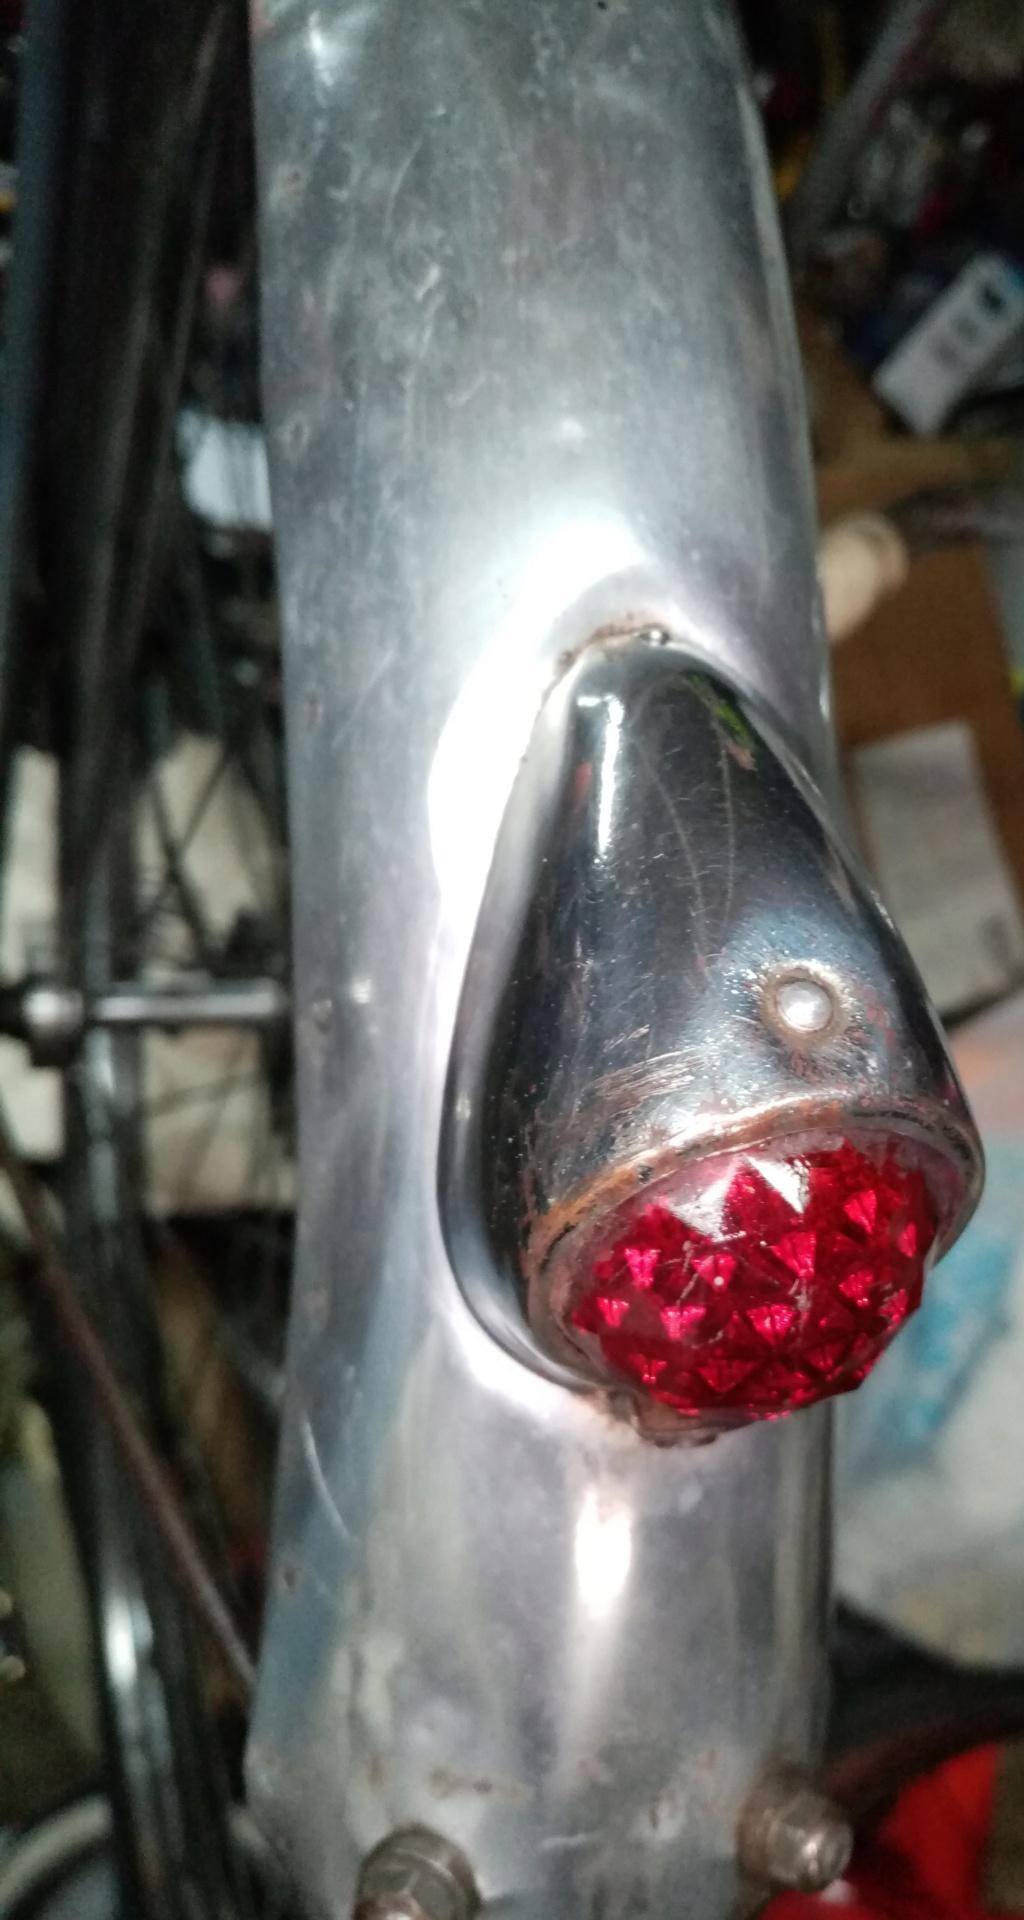 vélo mixte 1937-39 ROYAL FABRIC  3v CYCLO  02025